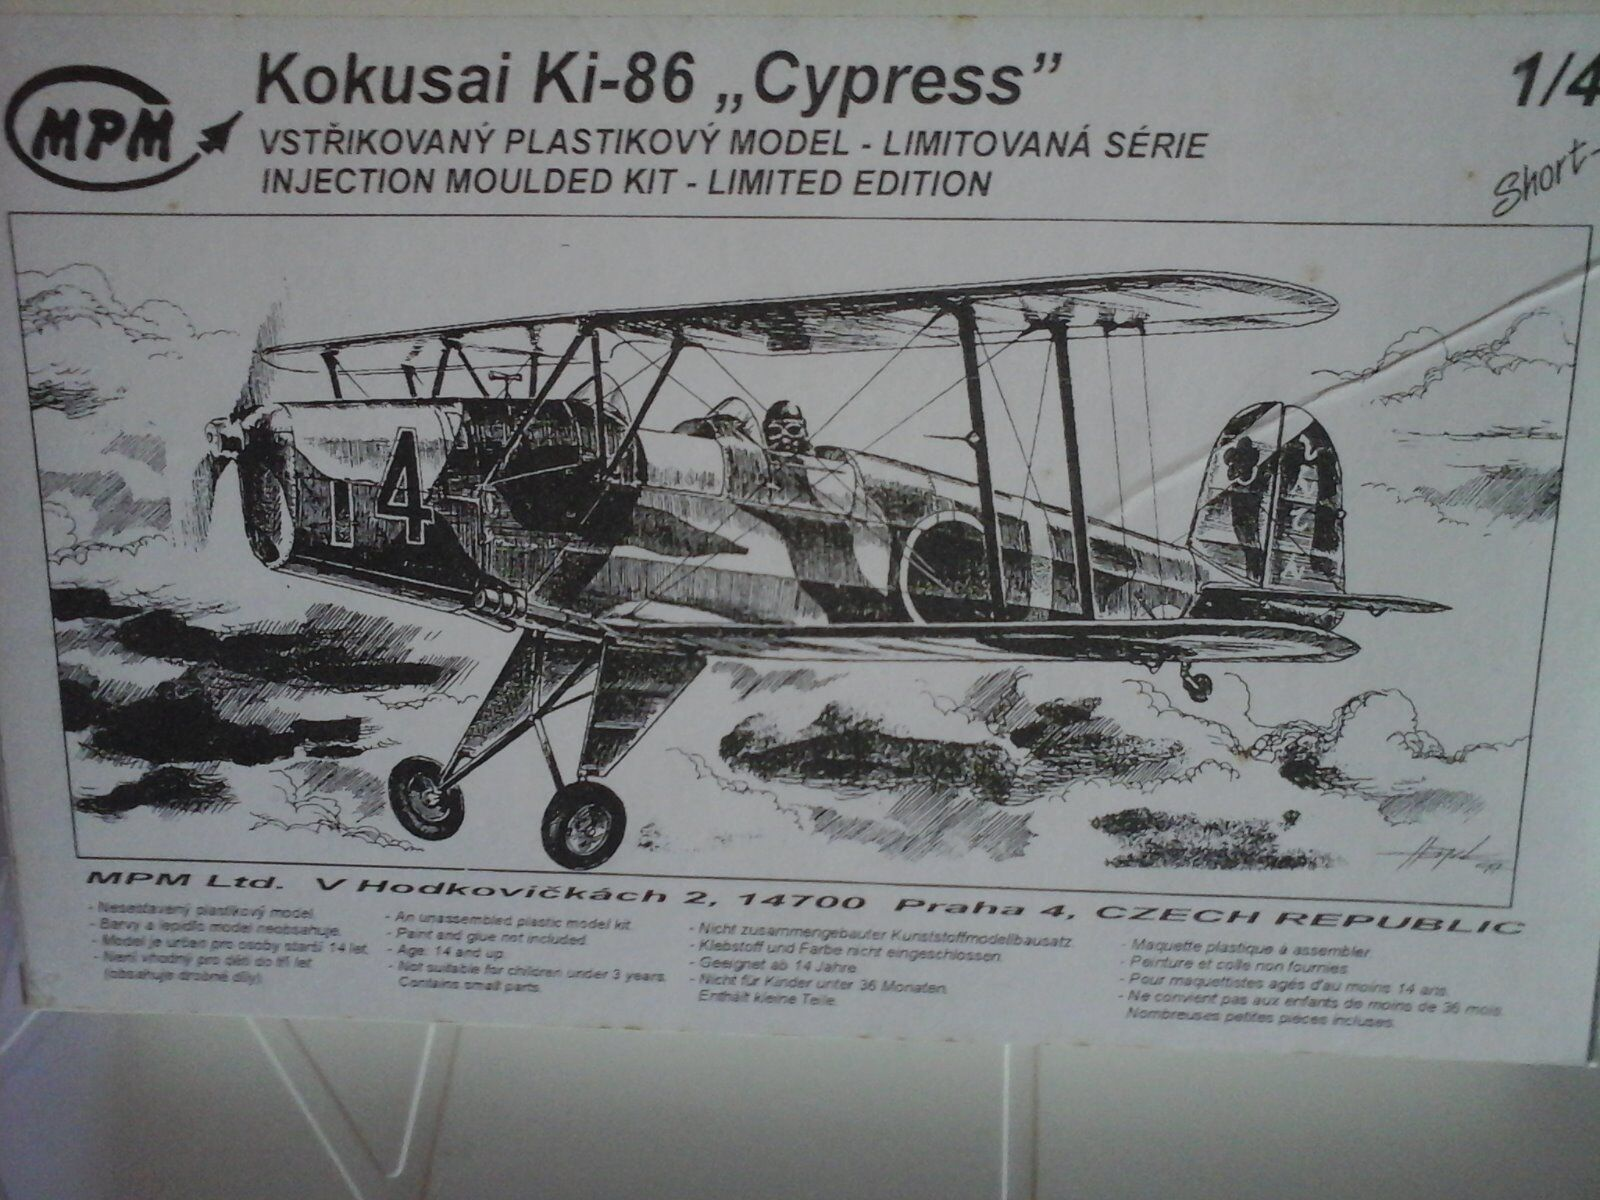 KOKUSAI KI 86 CYPRESS 1 48 SCALE MPM MODEL LIMITED EDITION + RESIN PARTS